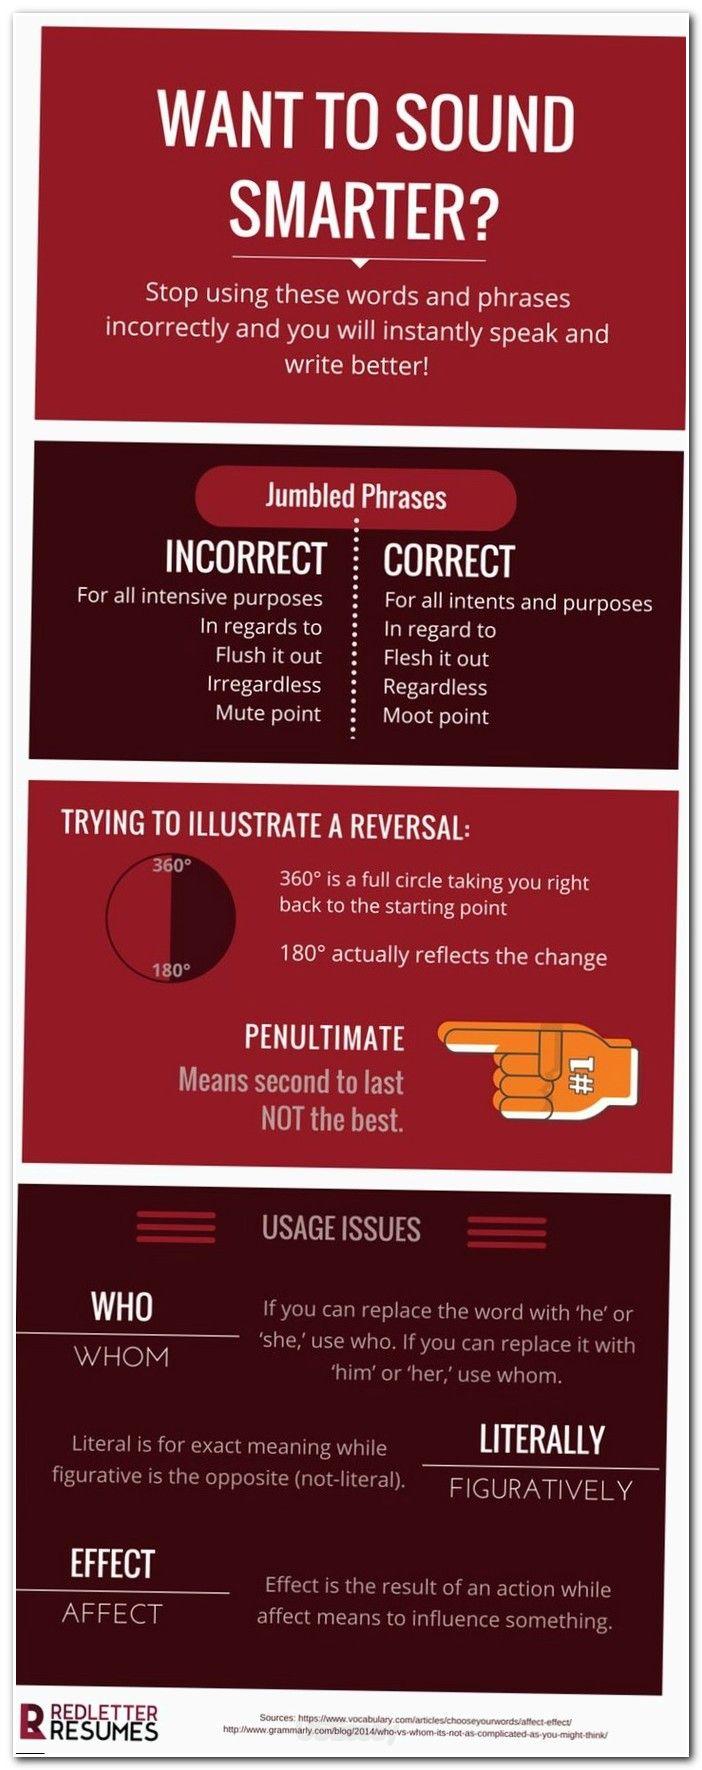 Reflective essay on critical thinking skills image 3